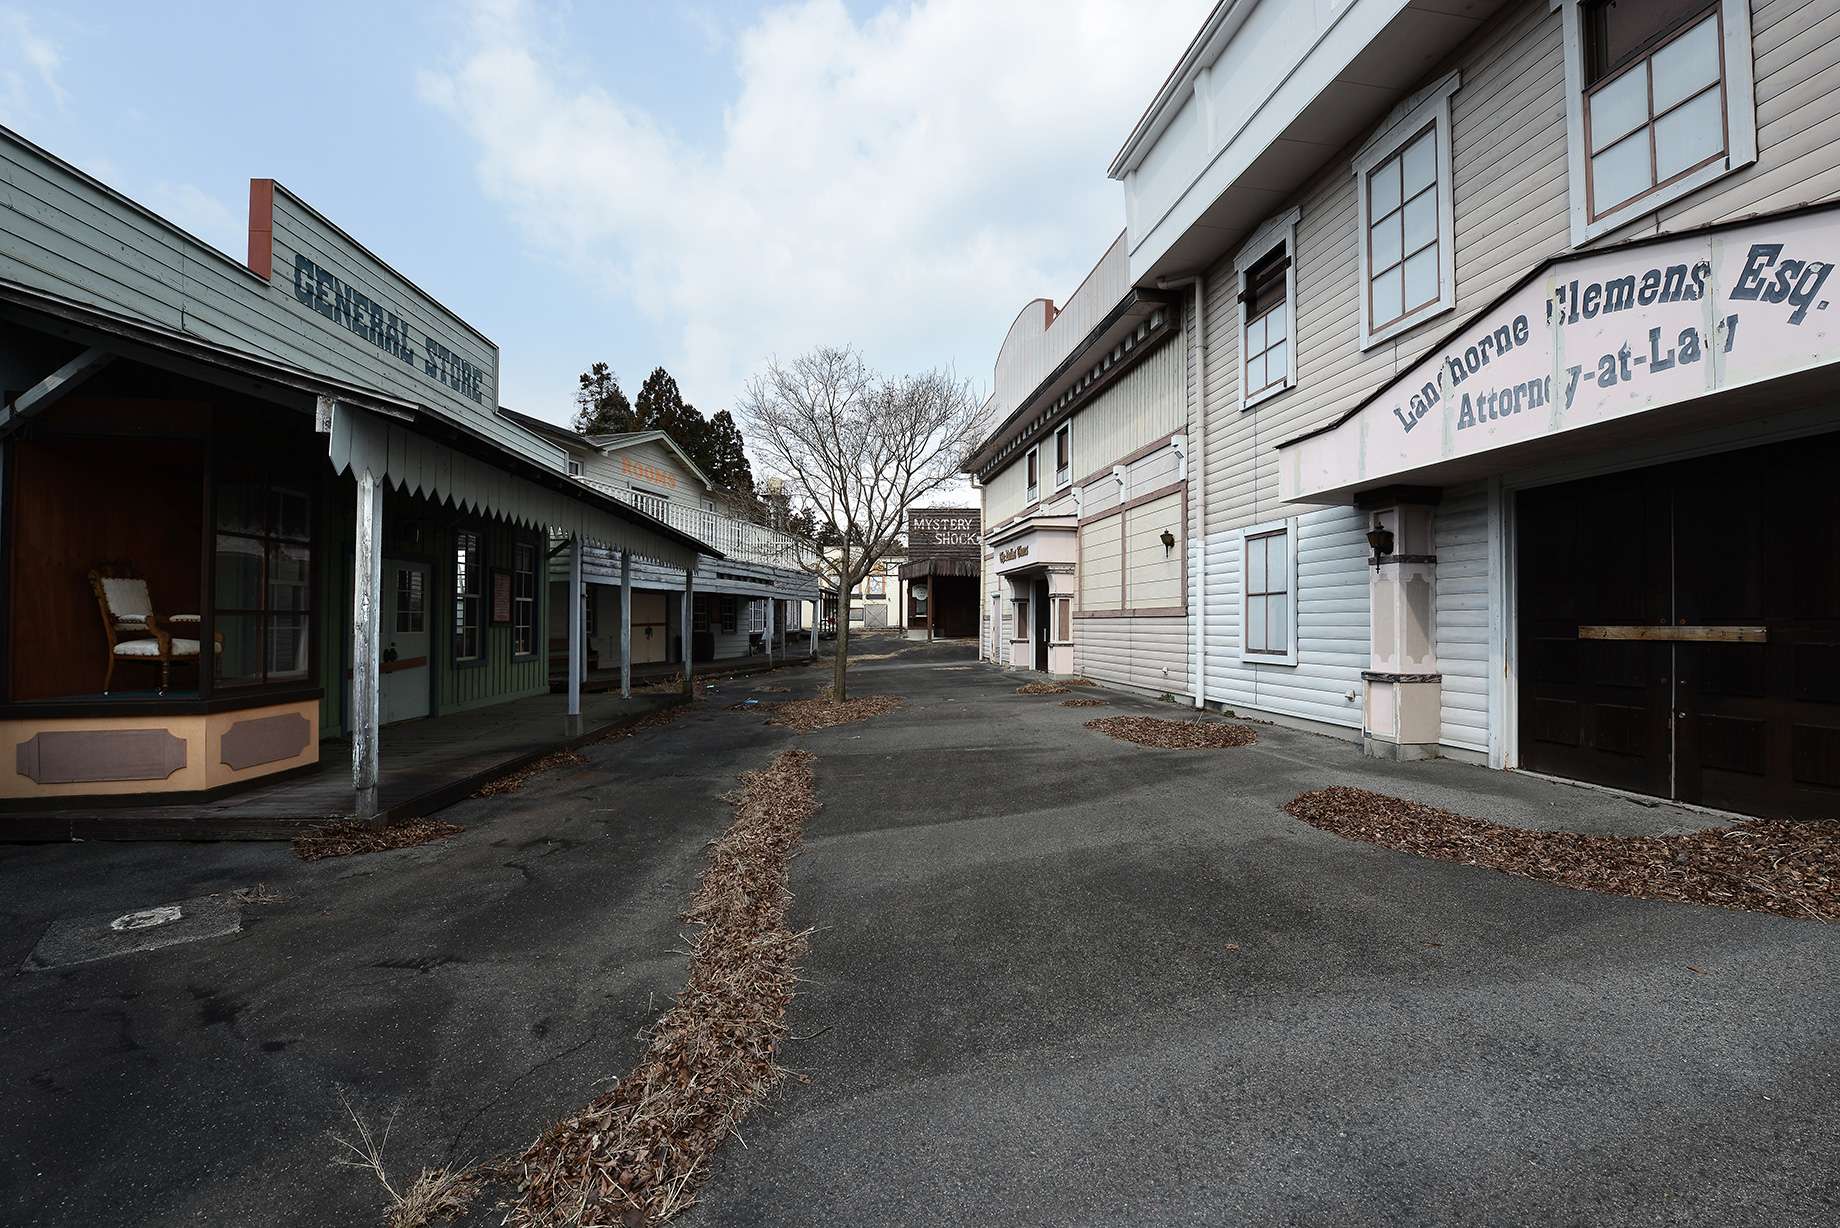 Western Village, Tochigi Prefecture, Japan. Photo by Reginald Van de Velde